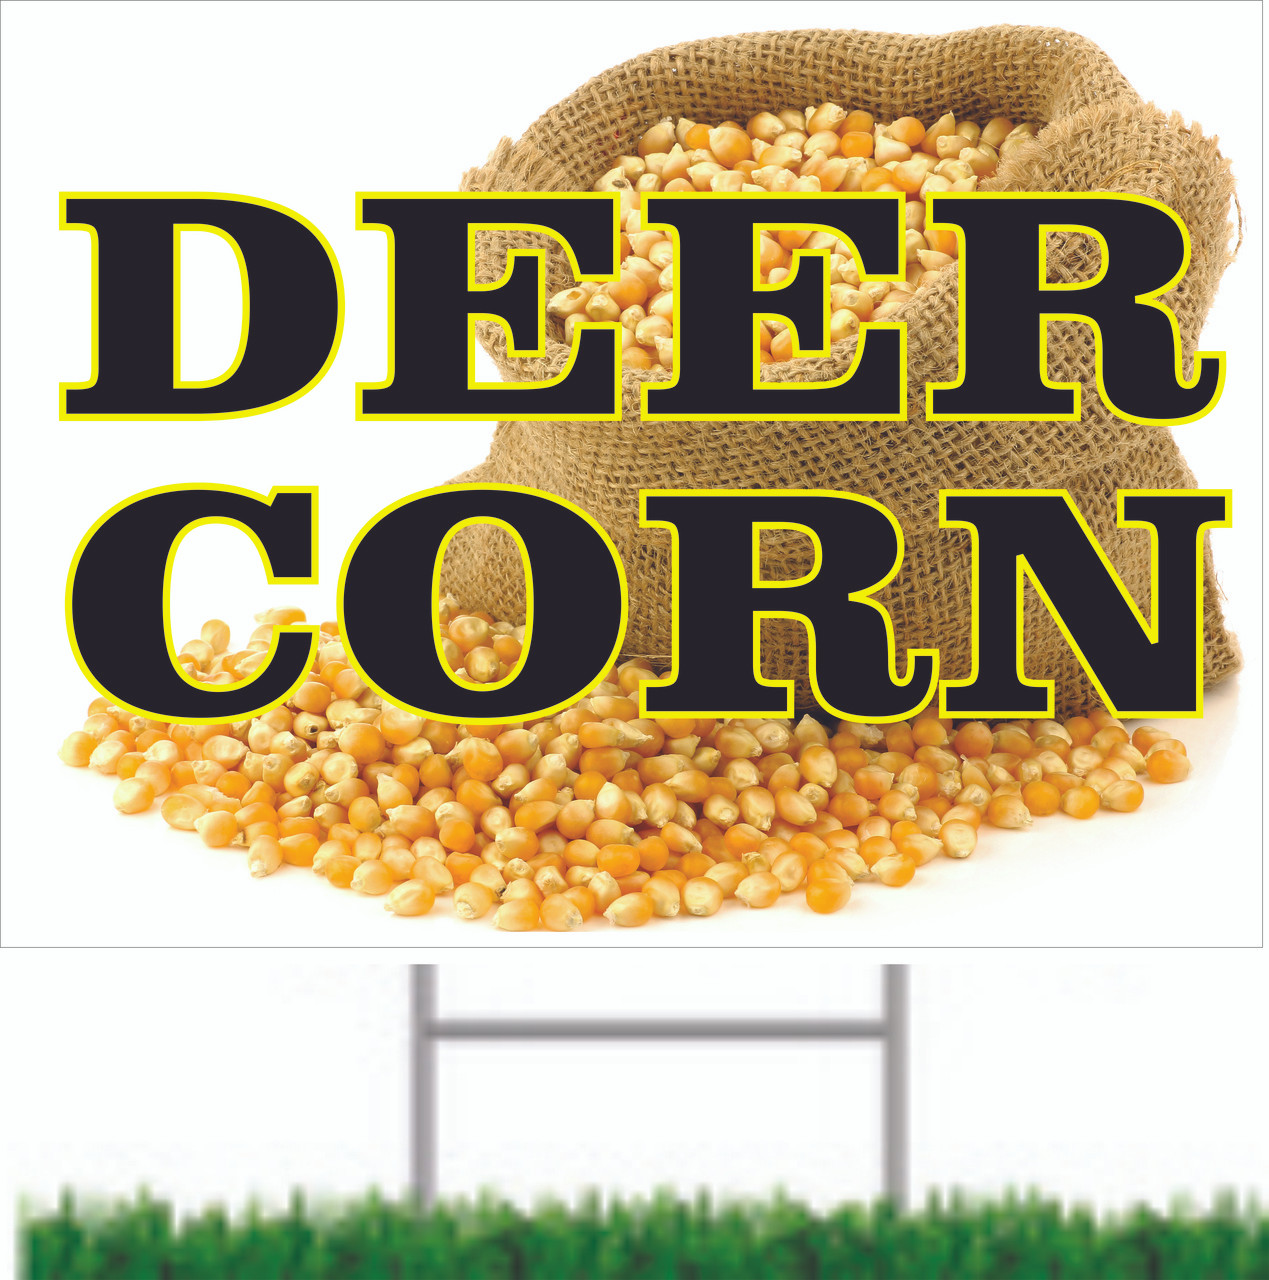 Colorful Deer Corn Road Sign Lets Hunters Know You Have Deer Corn.